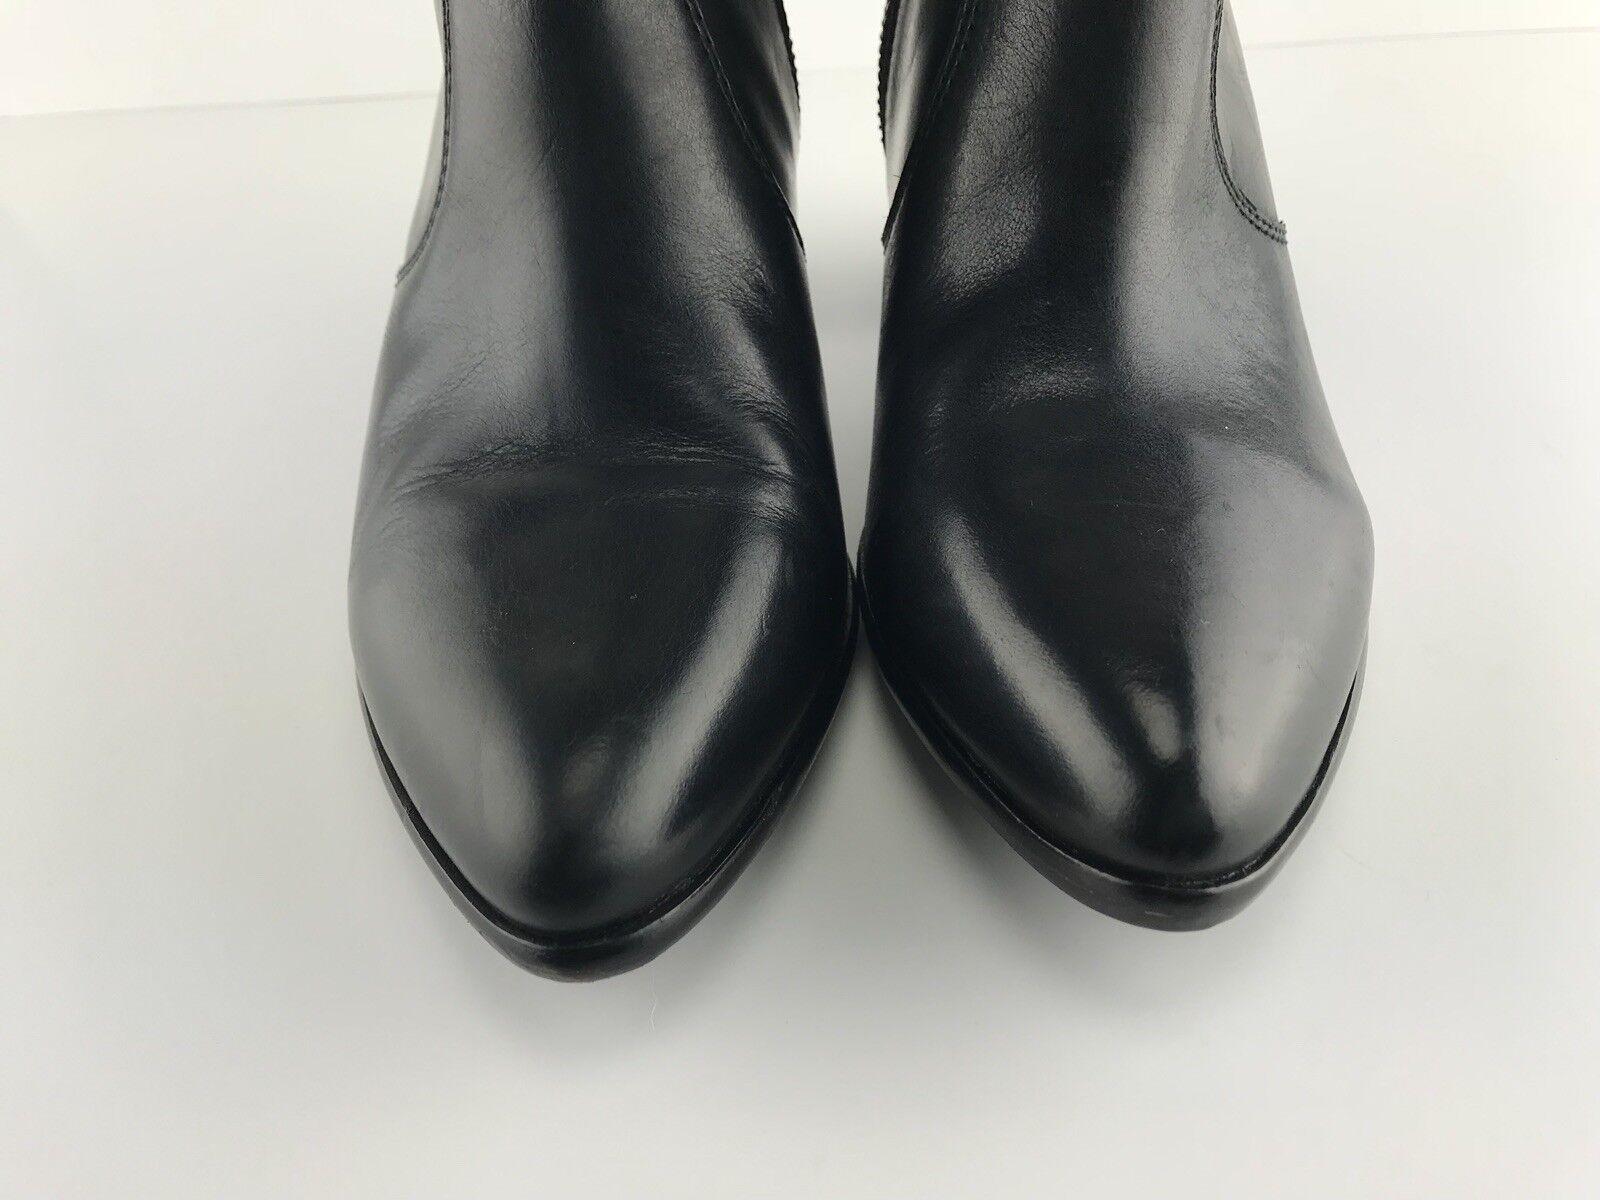 EUC Womens Frye Frye Frye Jennifer Black Leather Ankle Boots Size 9M 68c134